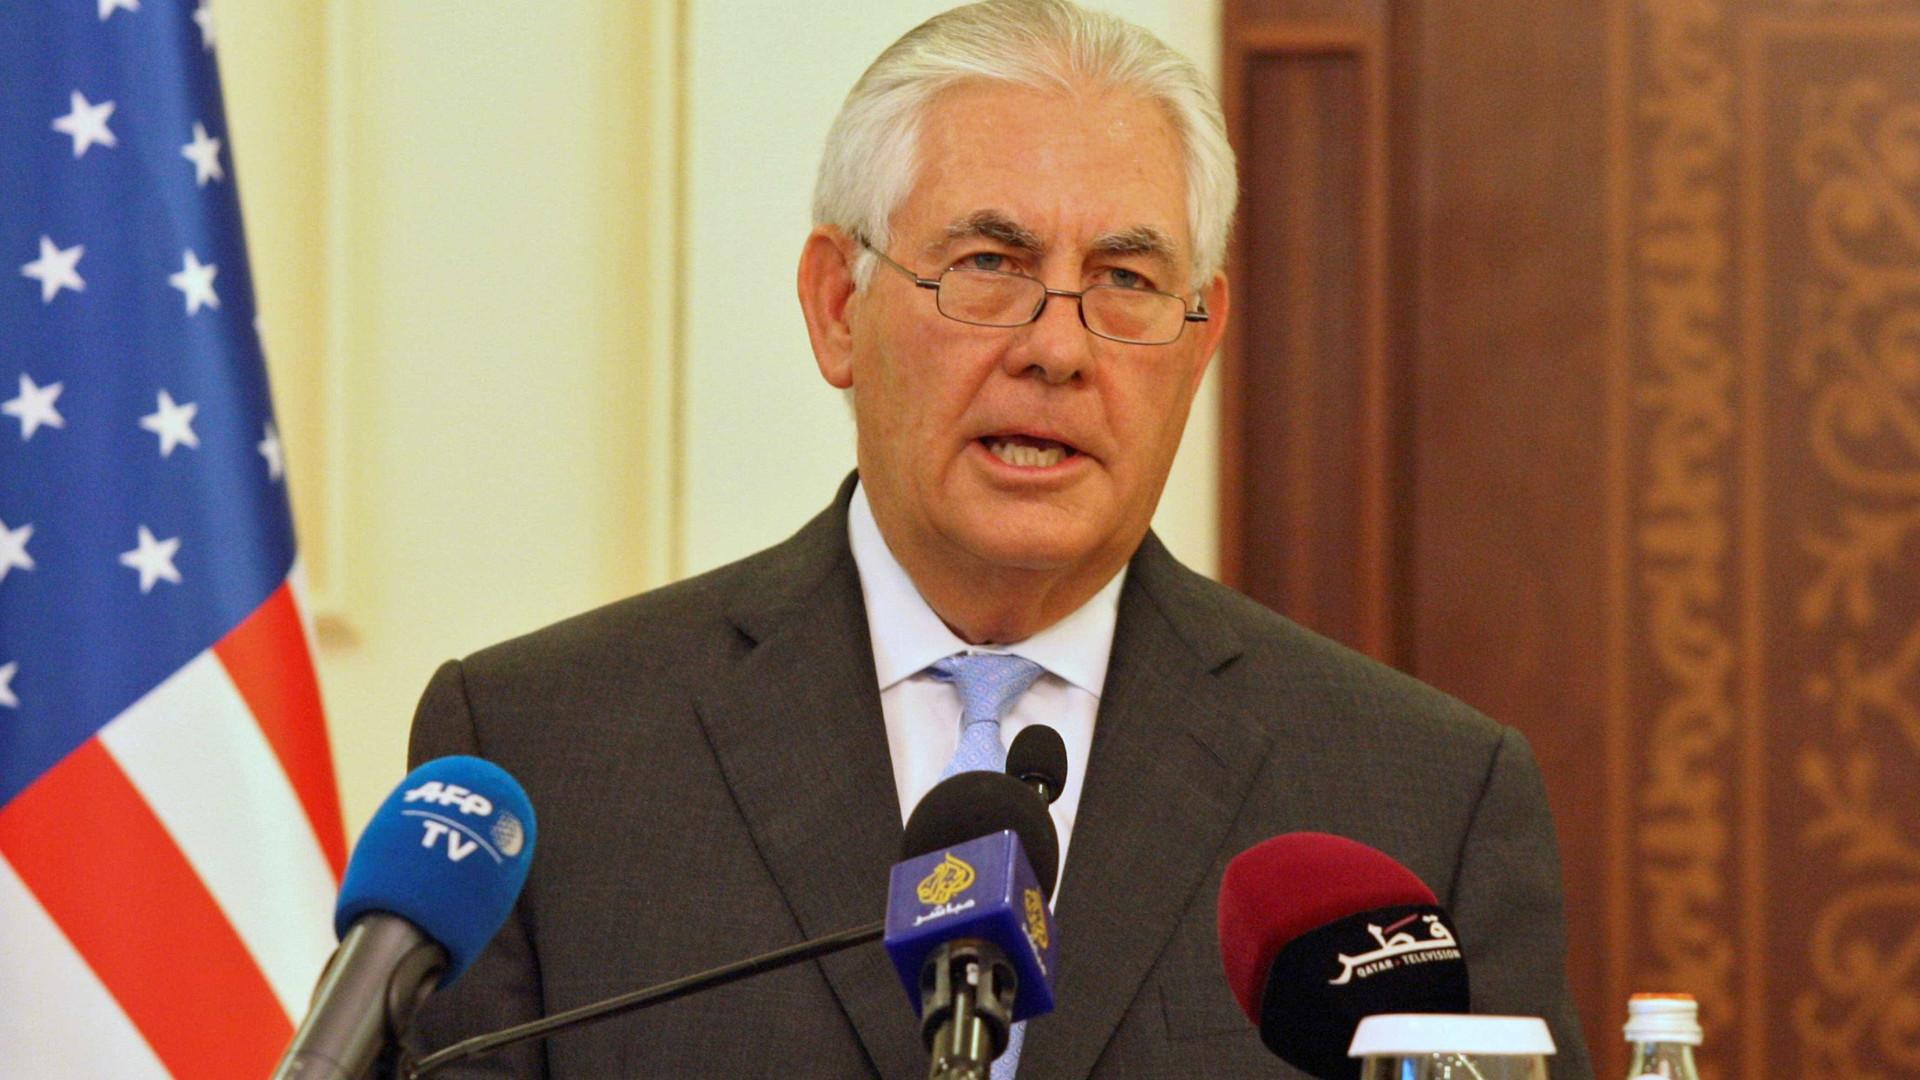 Birmânia desmente abusos contra rohingya antes de Tillerson chegar